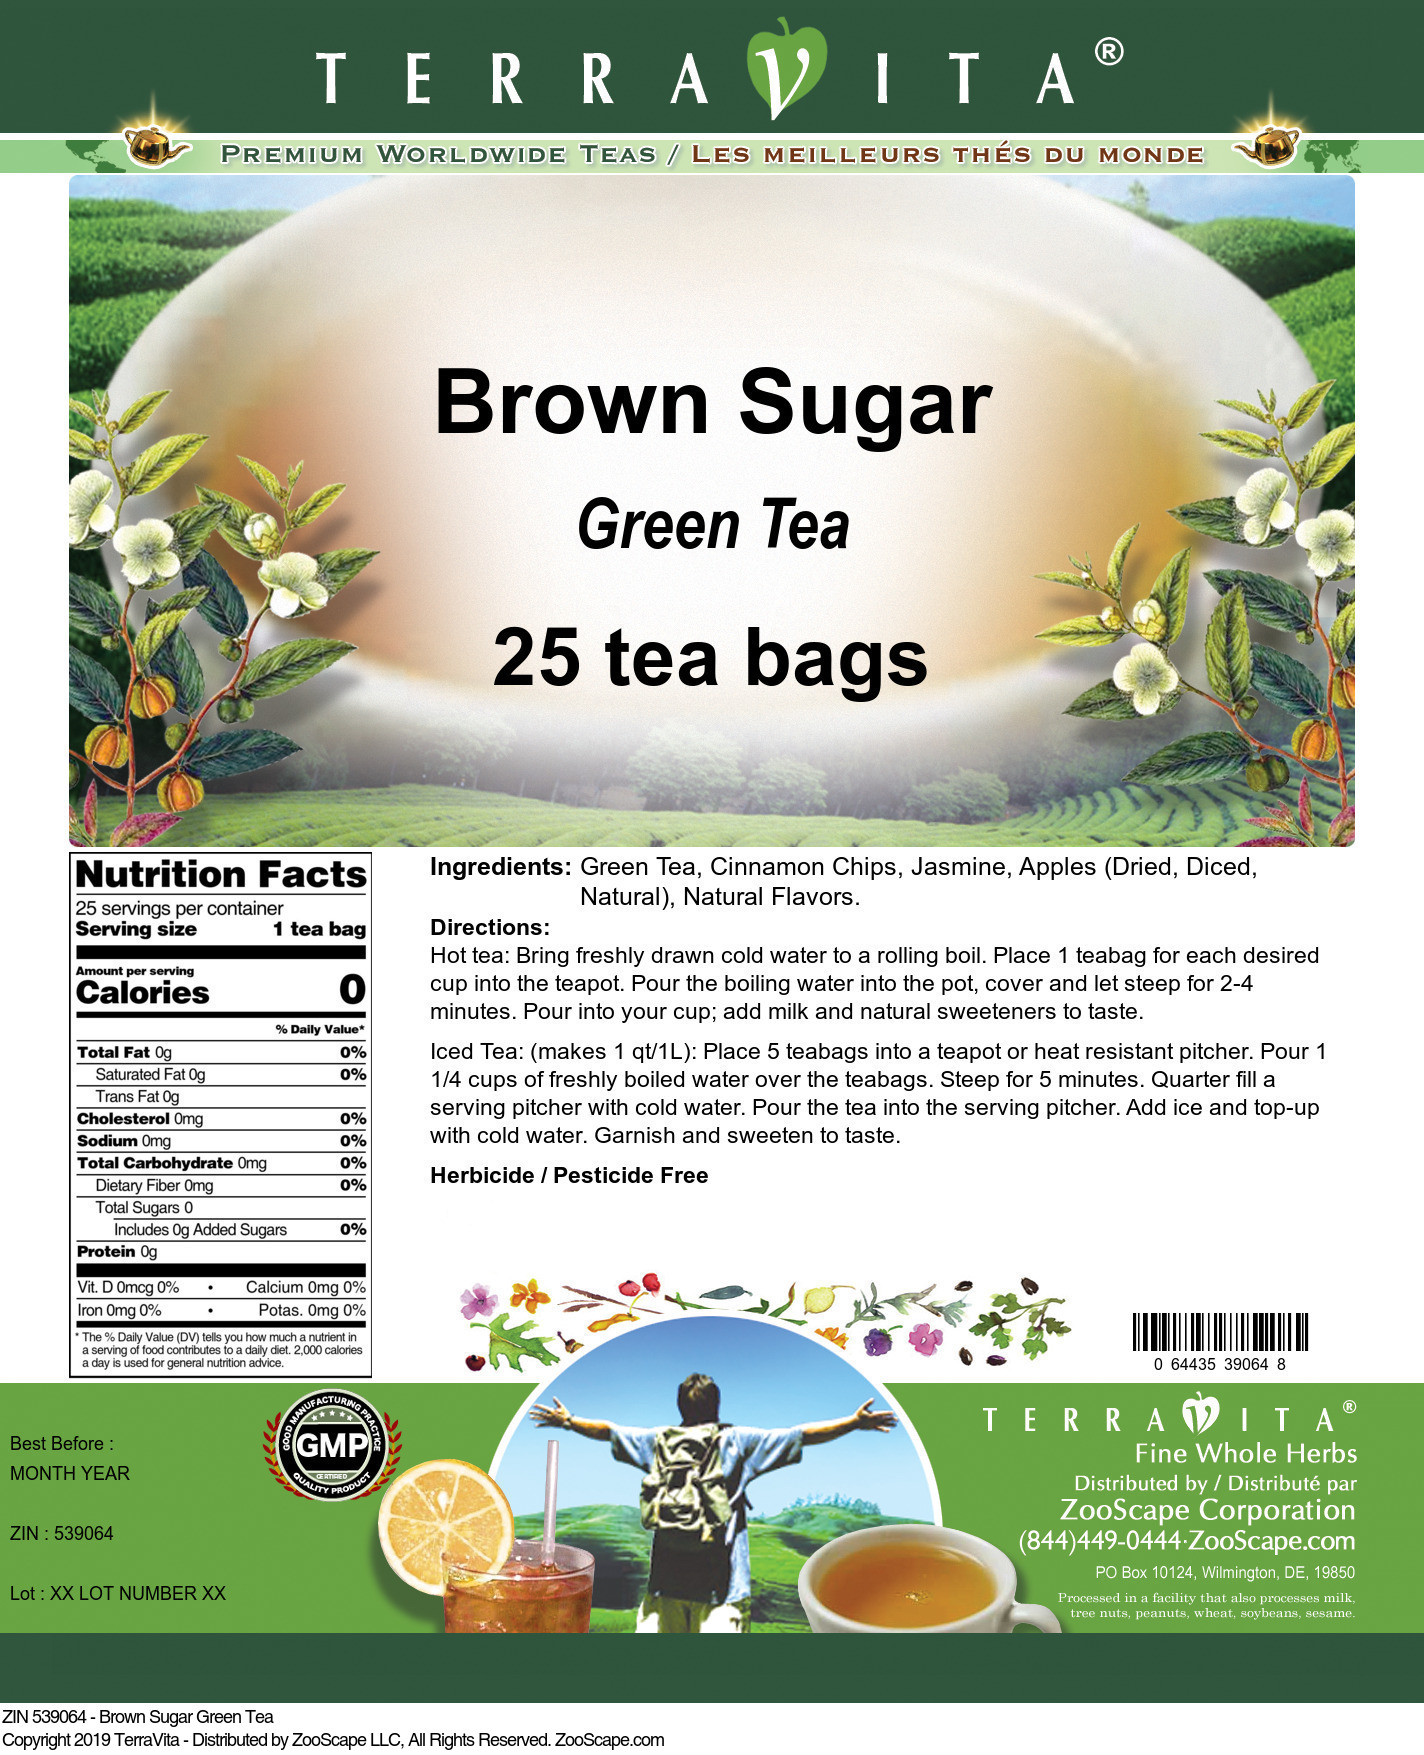 Brown Sugar Green Tea